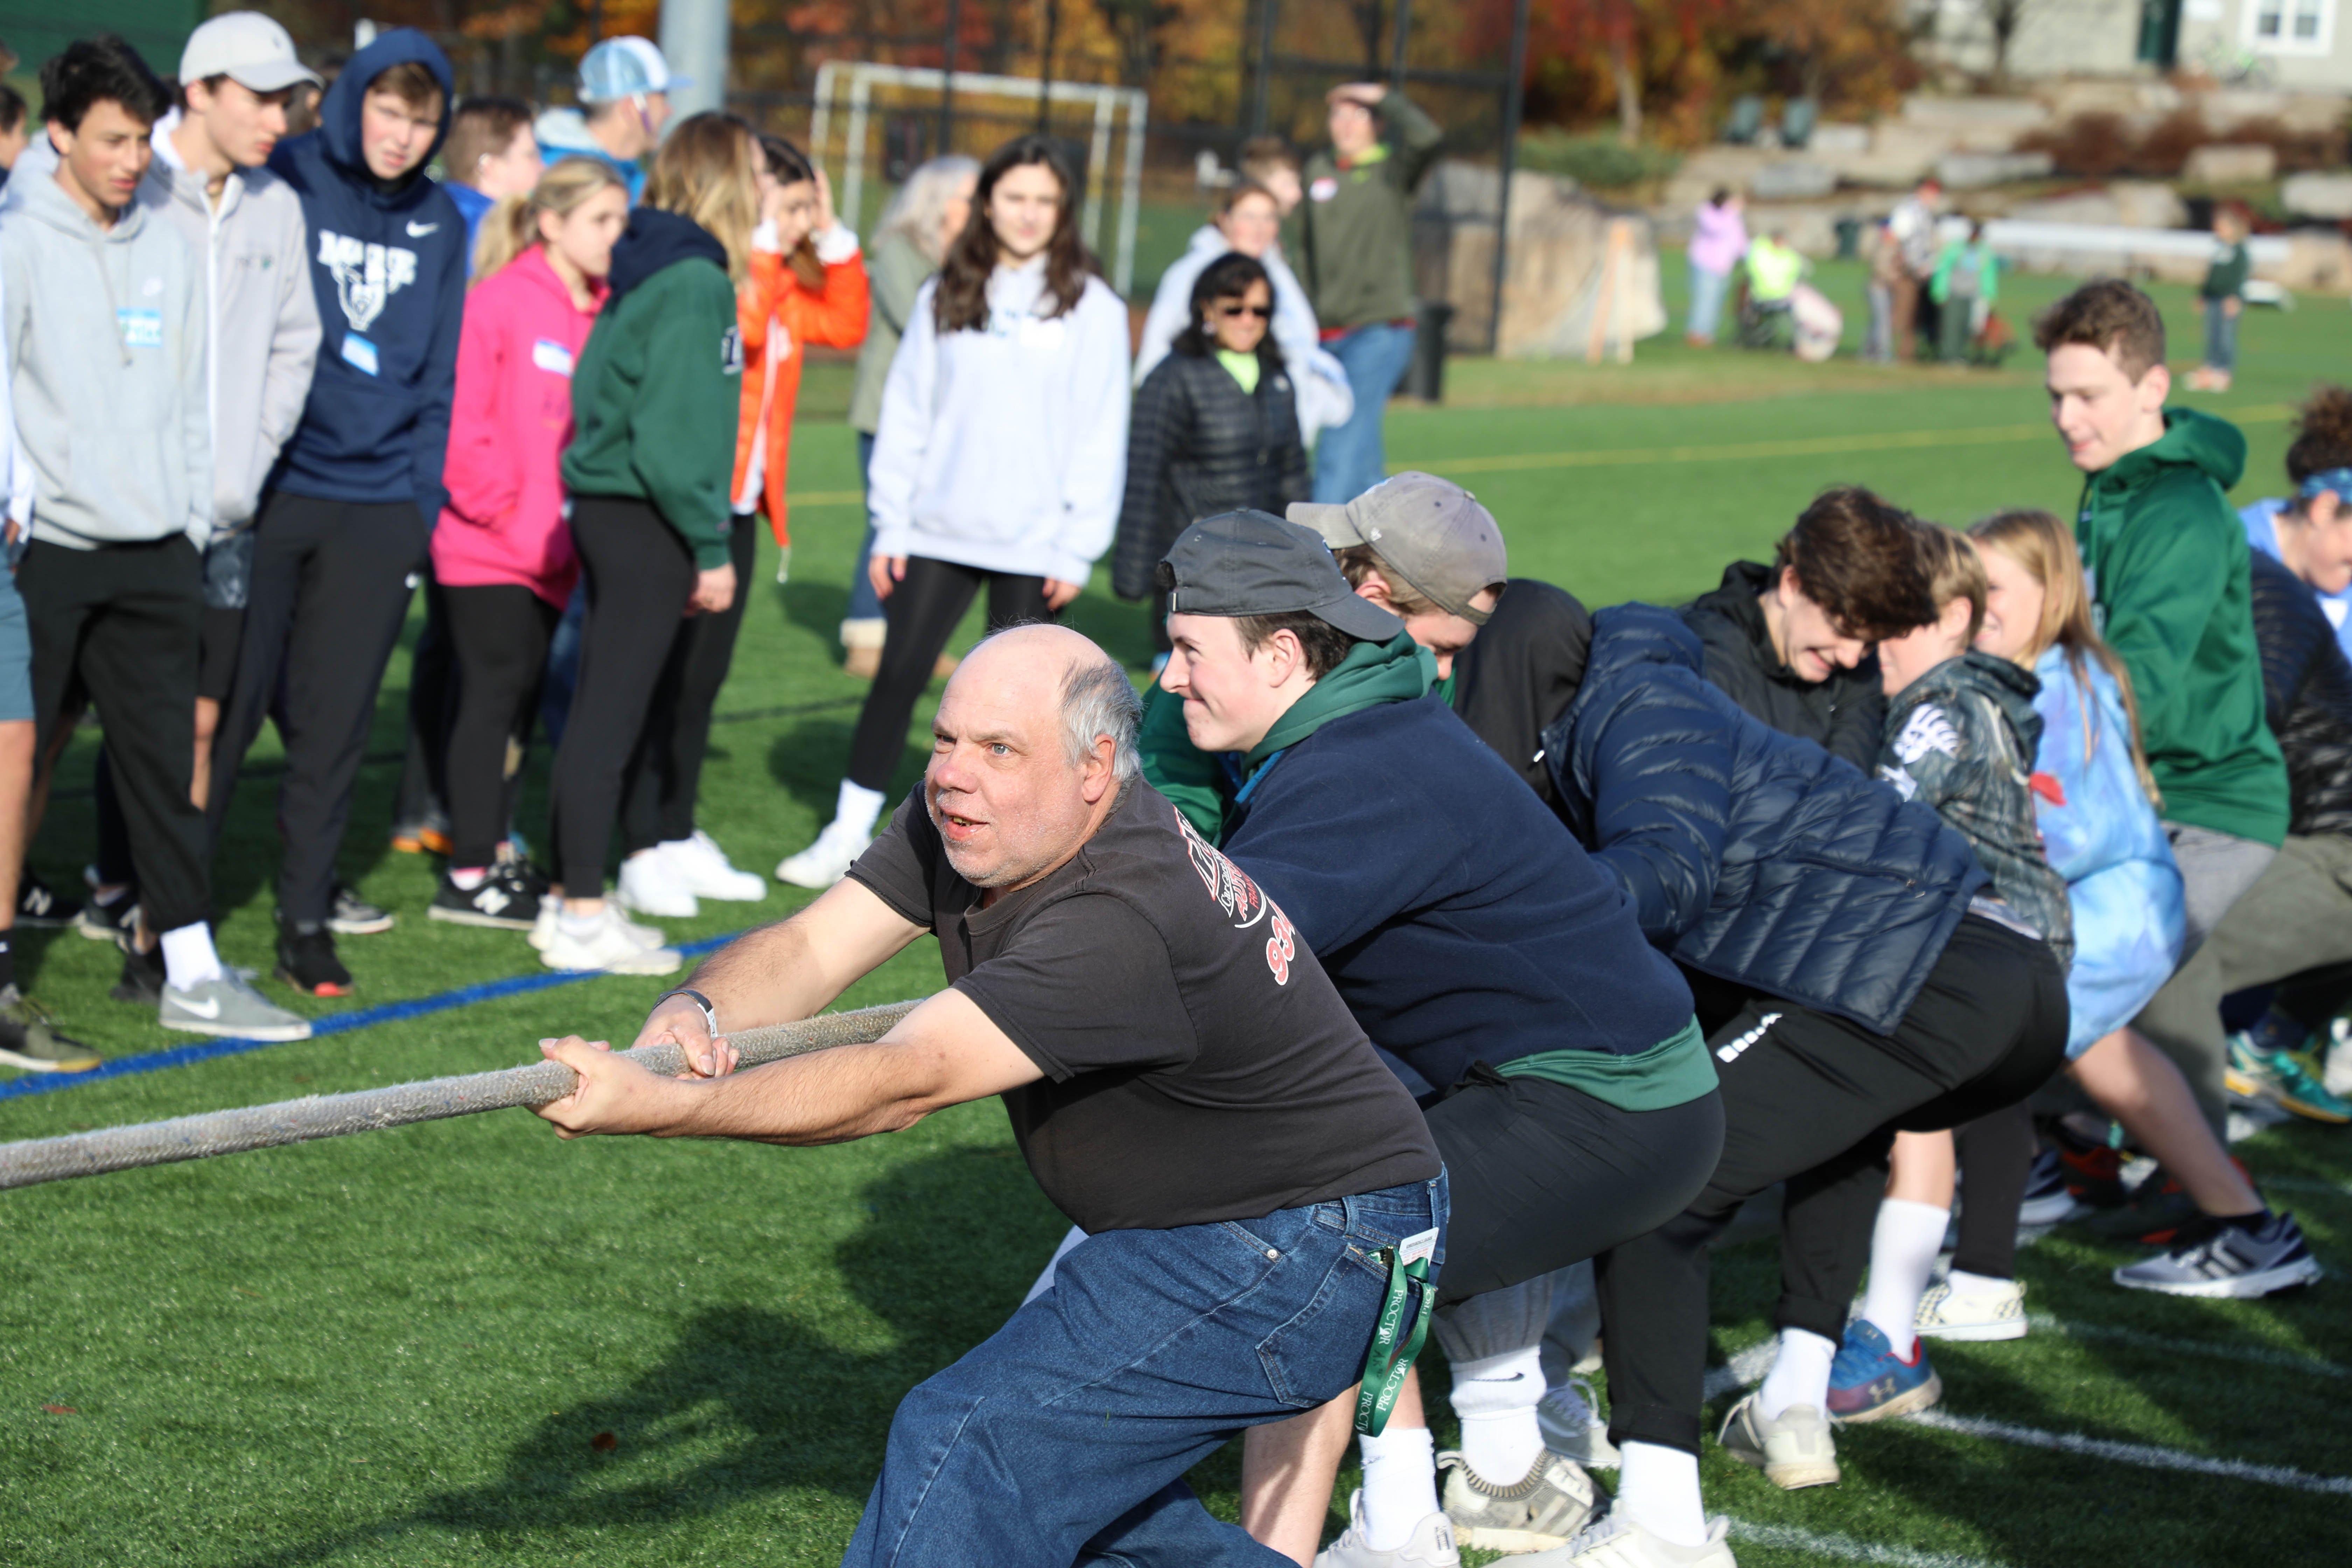 Proctor Academy Prep School Special Olympics